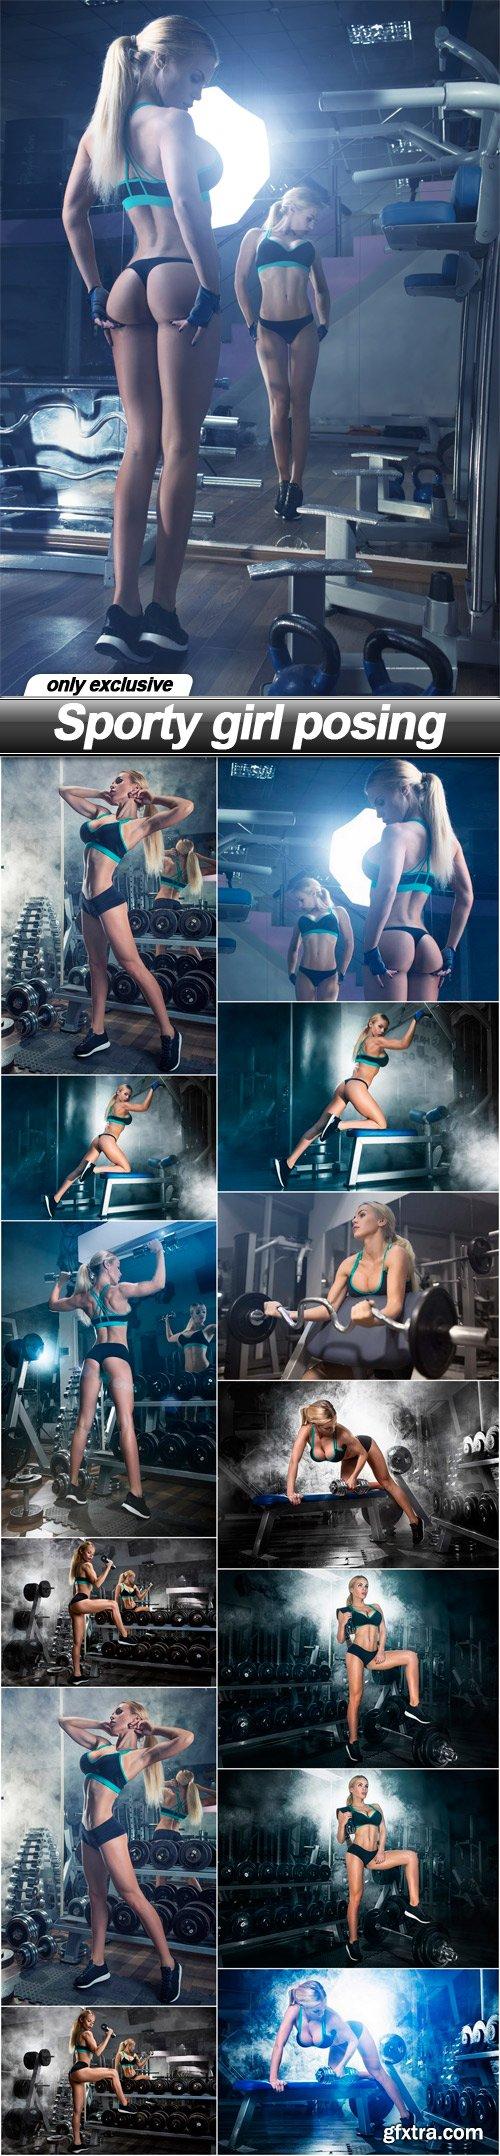 Sporty girl posing - 14 UHQ JPEG